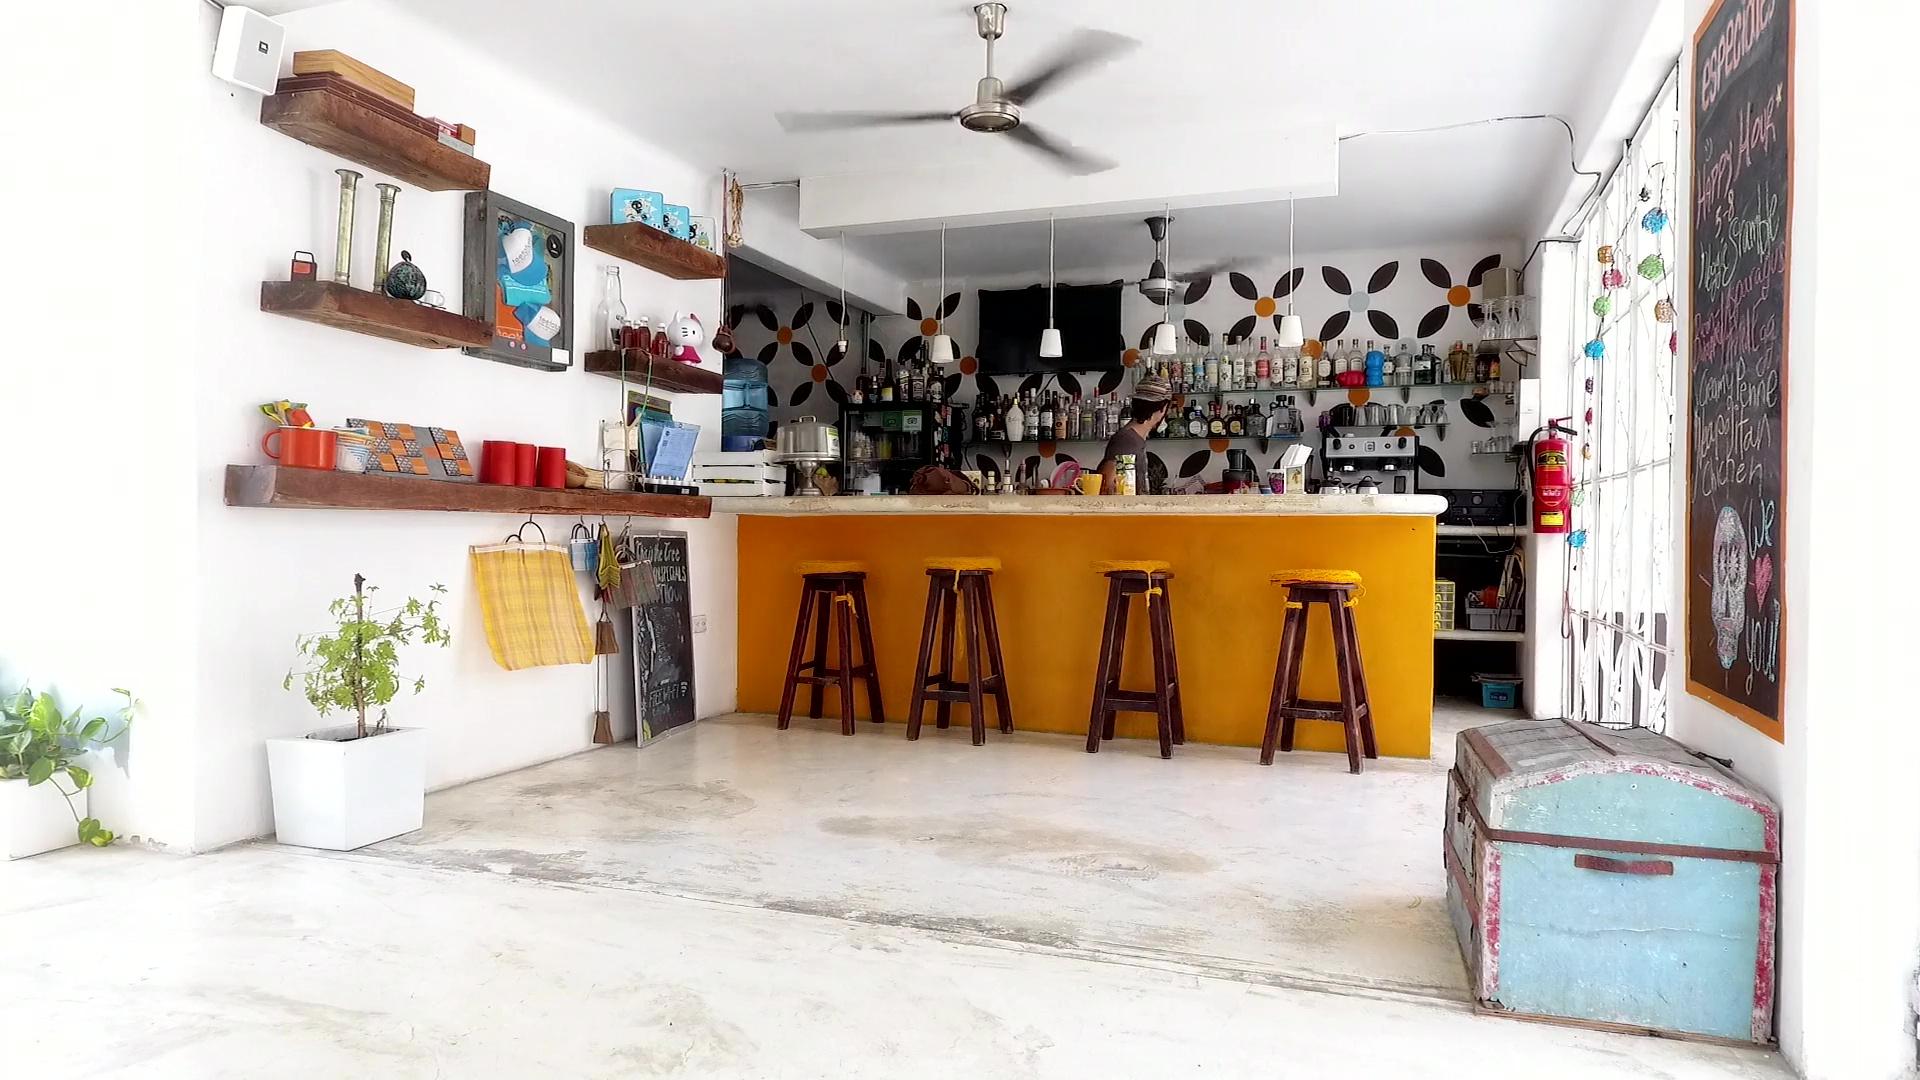 Miami Florida Digital Marketing and Web Design